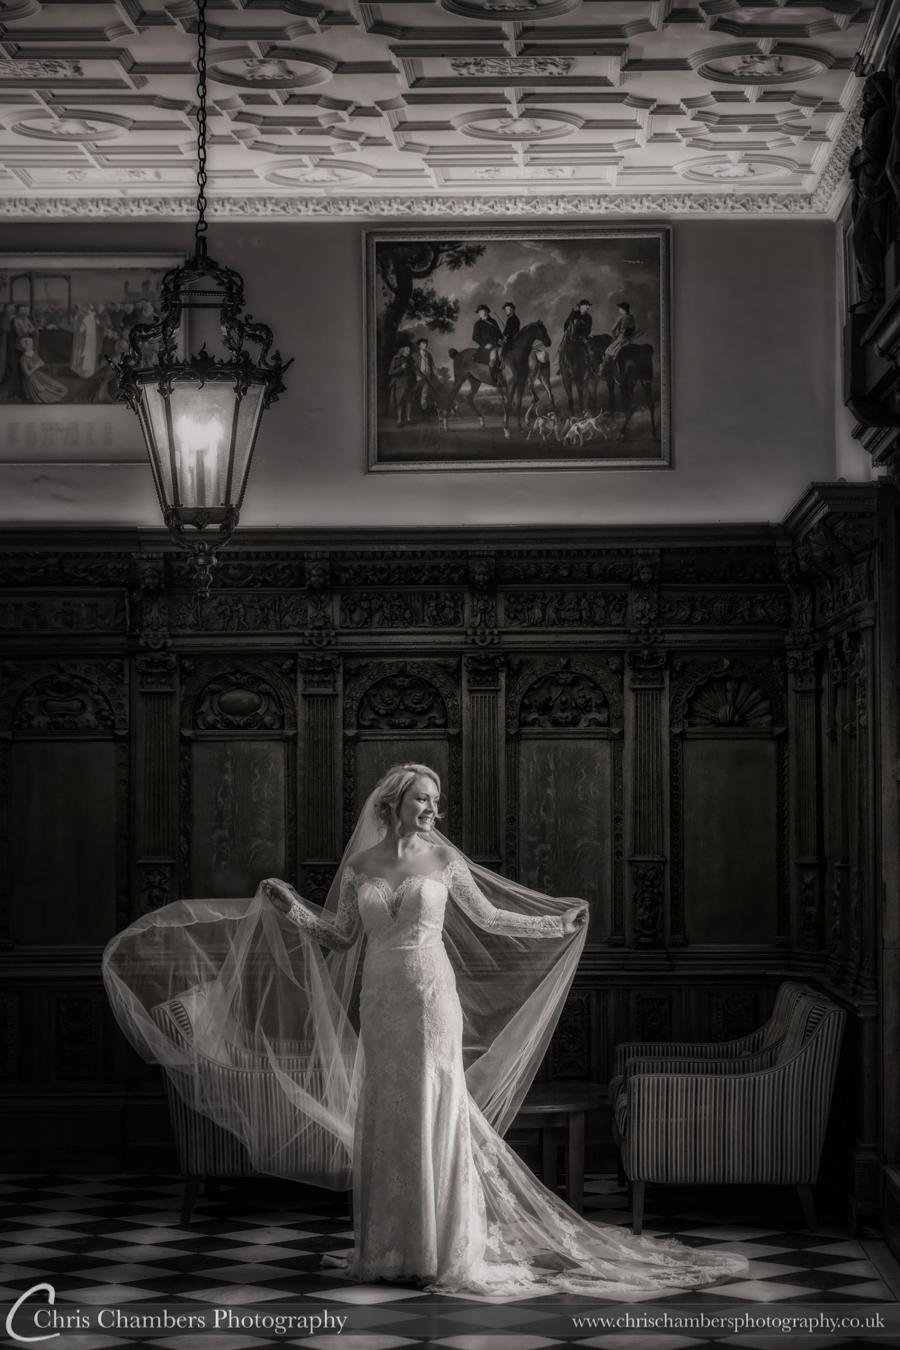 Hazlewood Castle wedding photographs in North Yorkshire, Chris Chambers wedding photography, Bride and groom wedding photographer